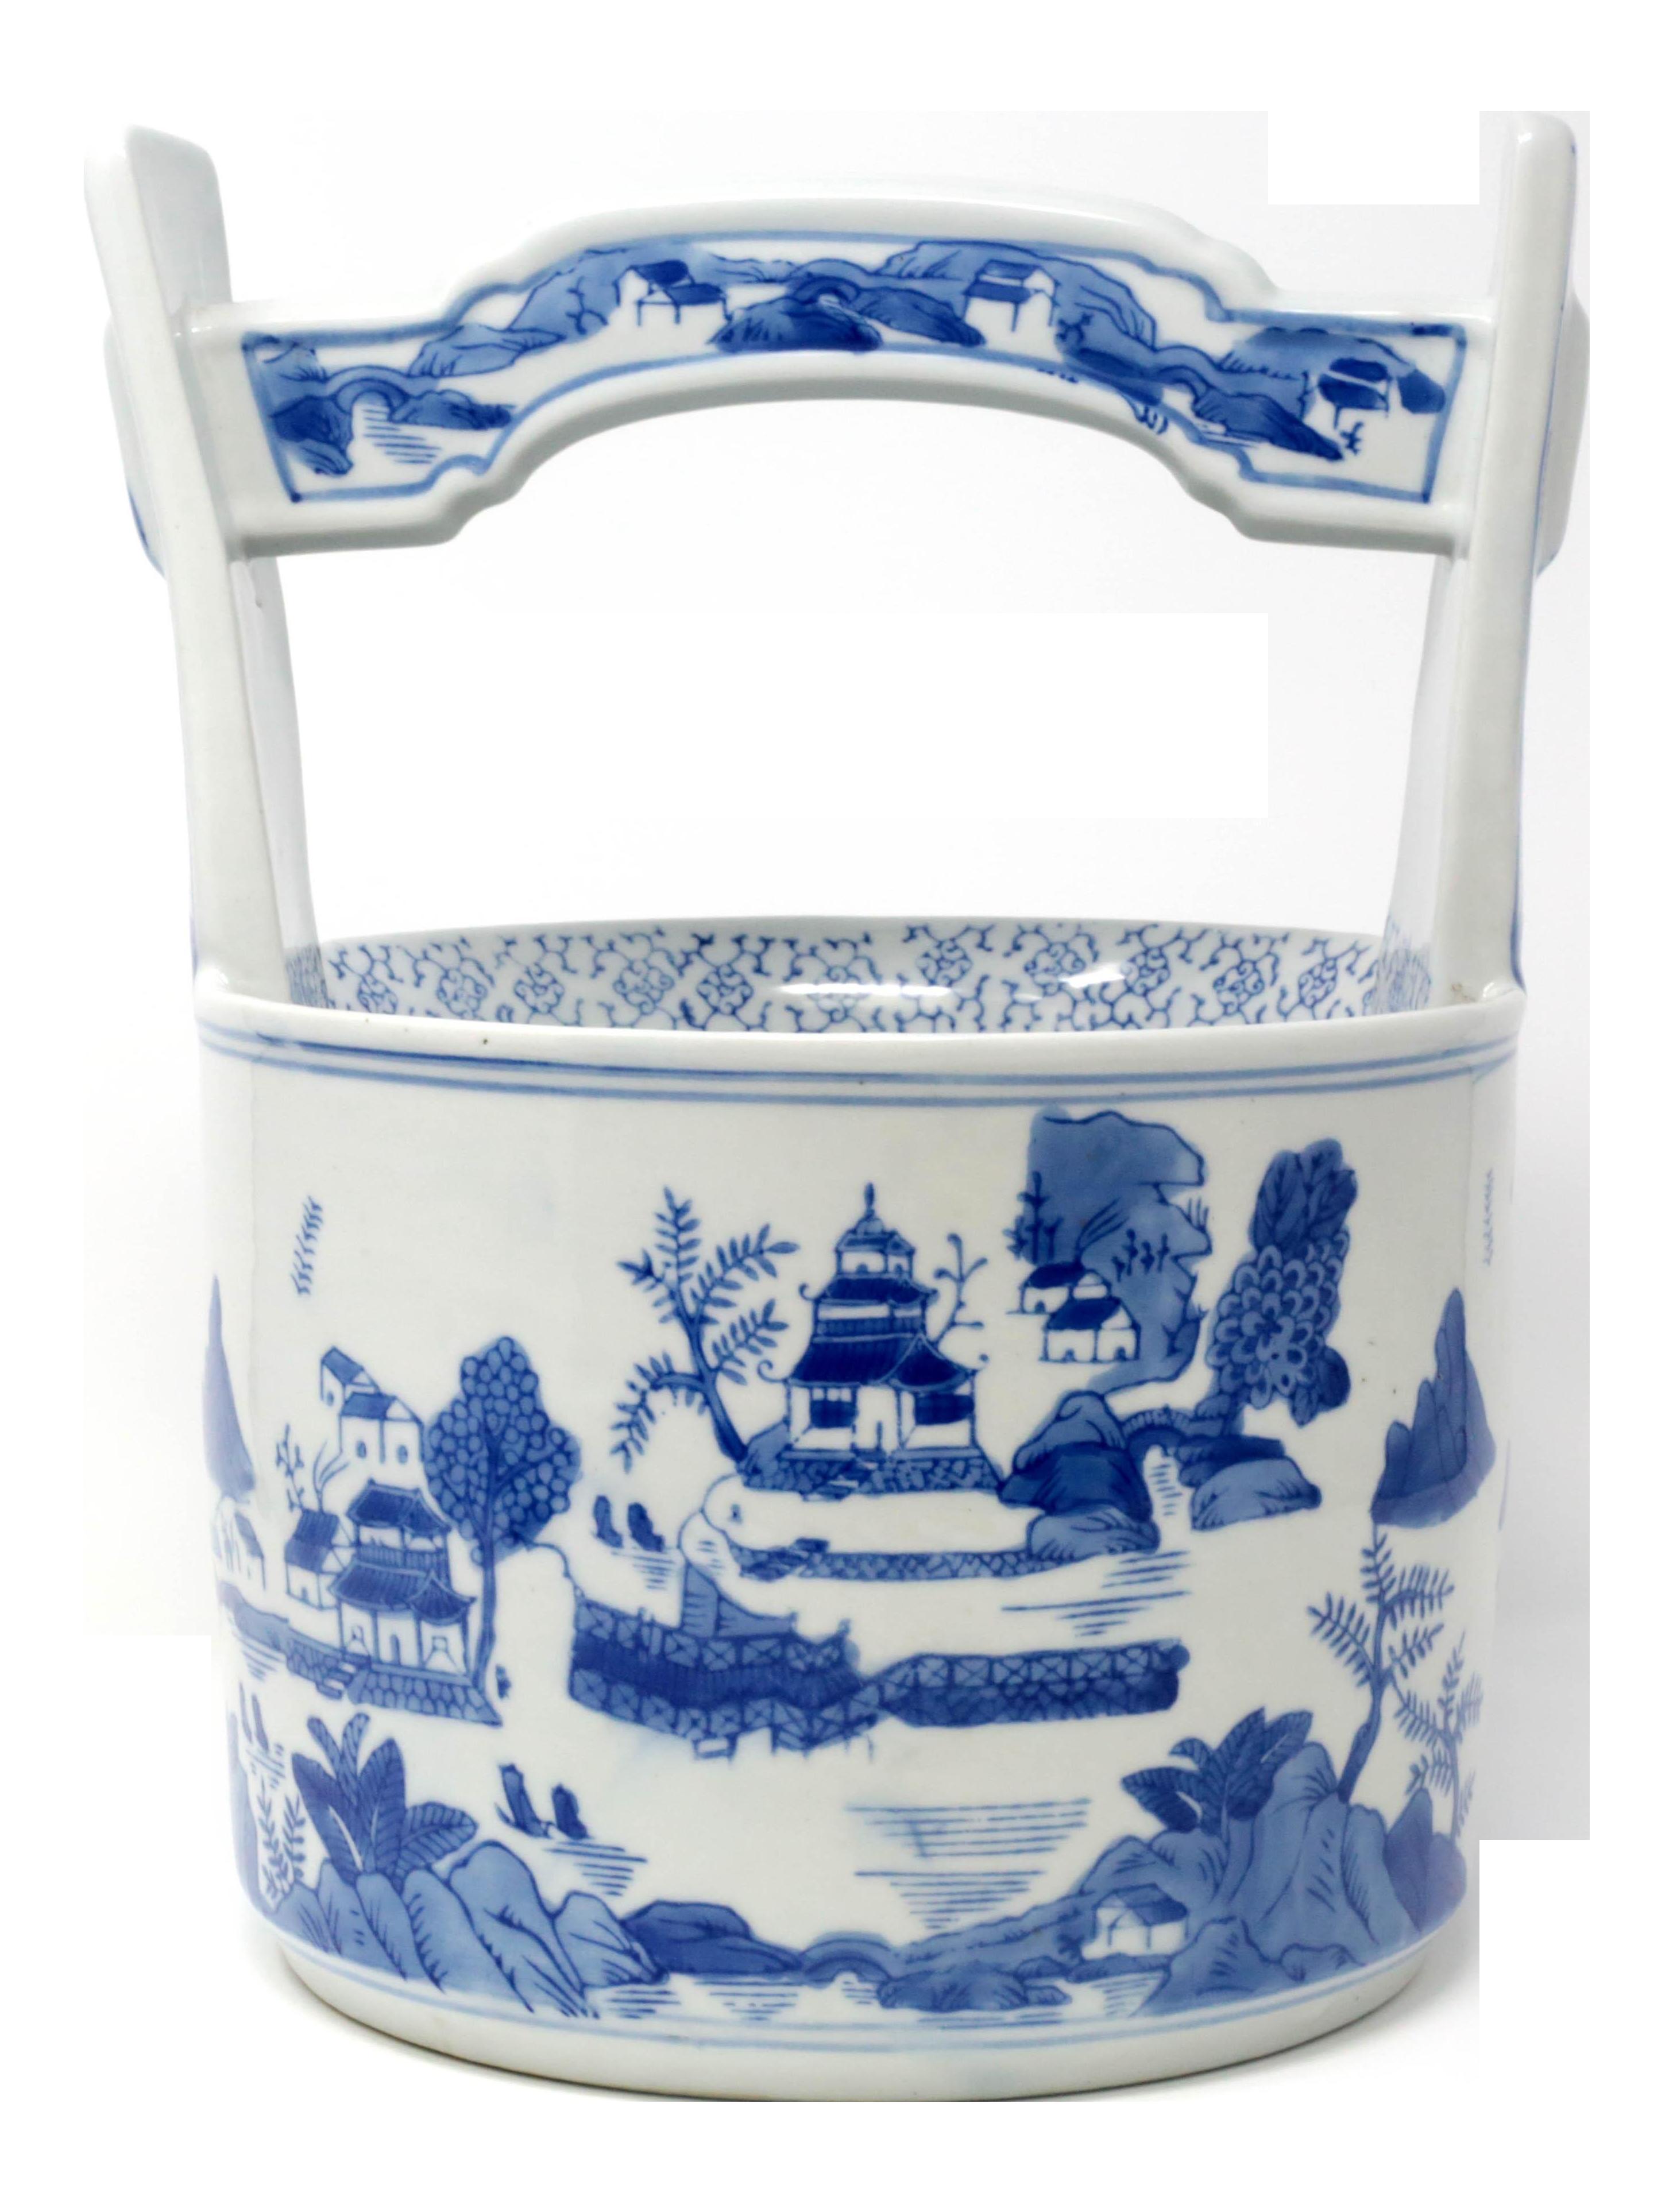 Blue And White Chinese Ceramic Wishing Well Planter